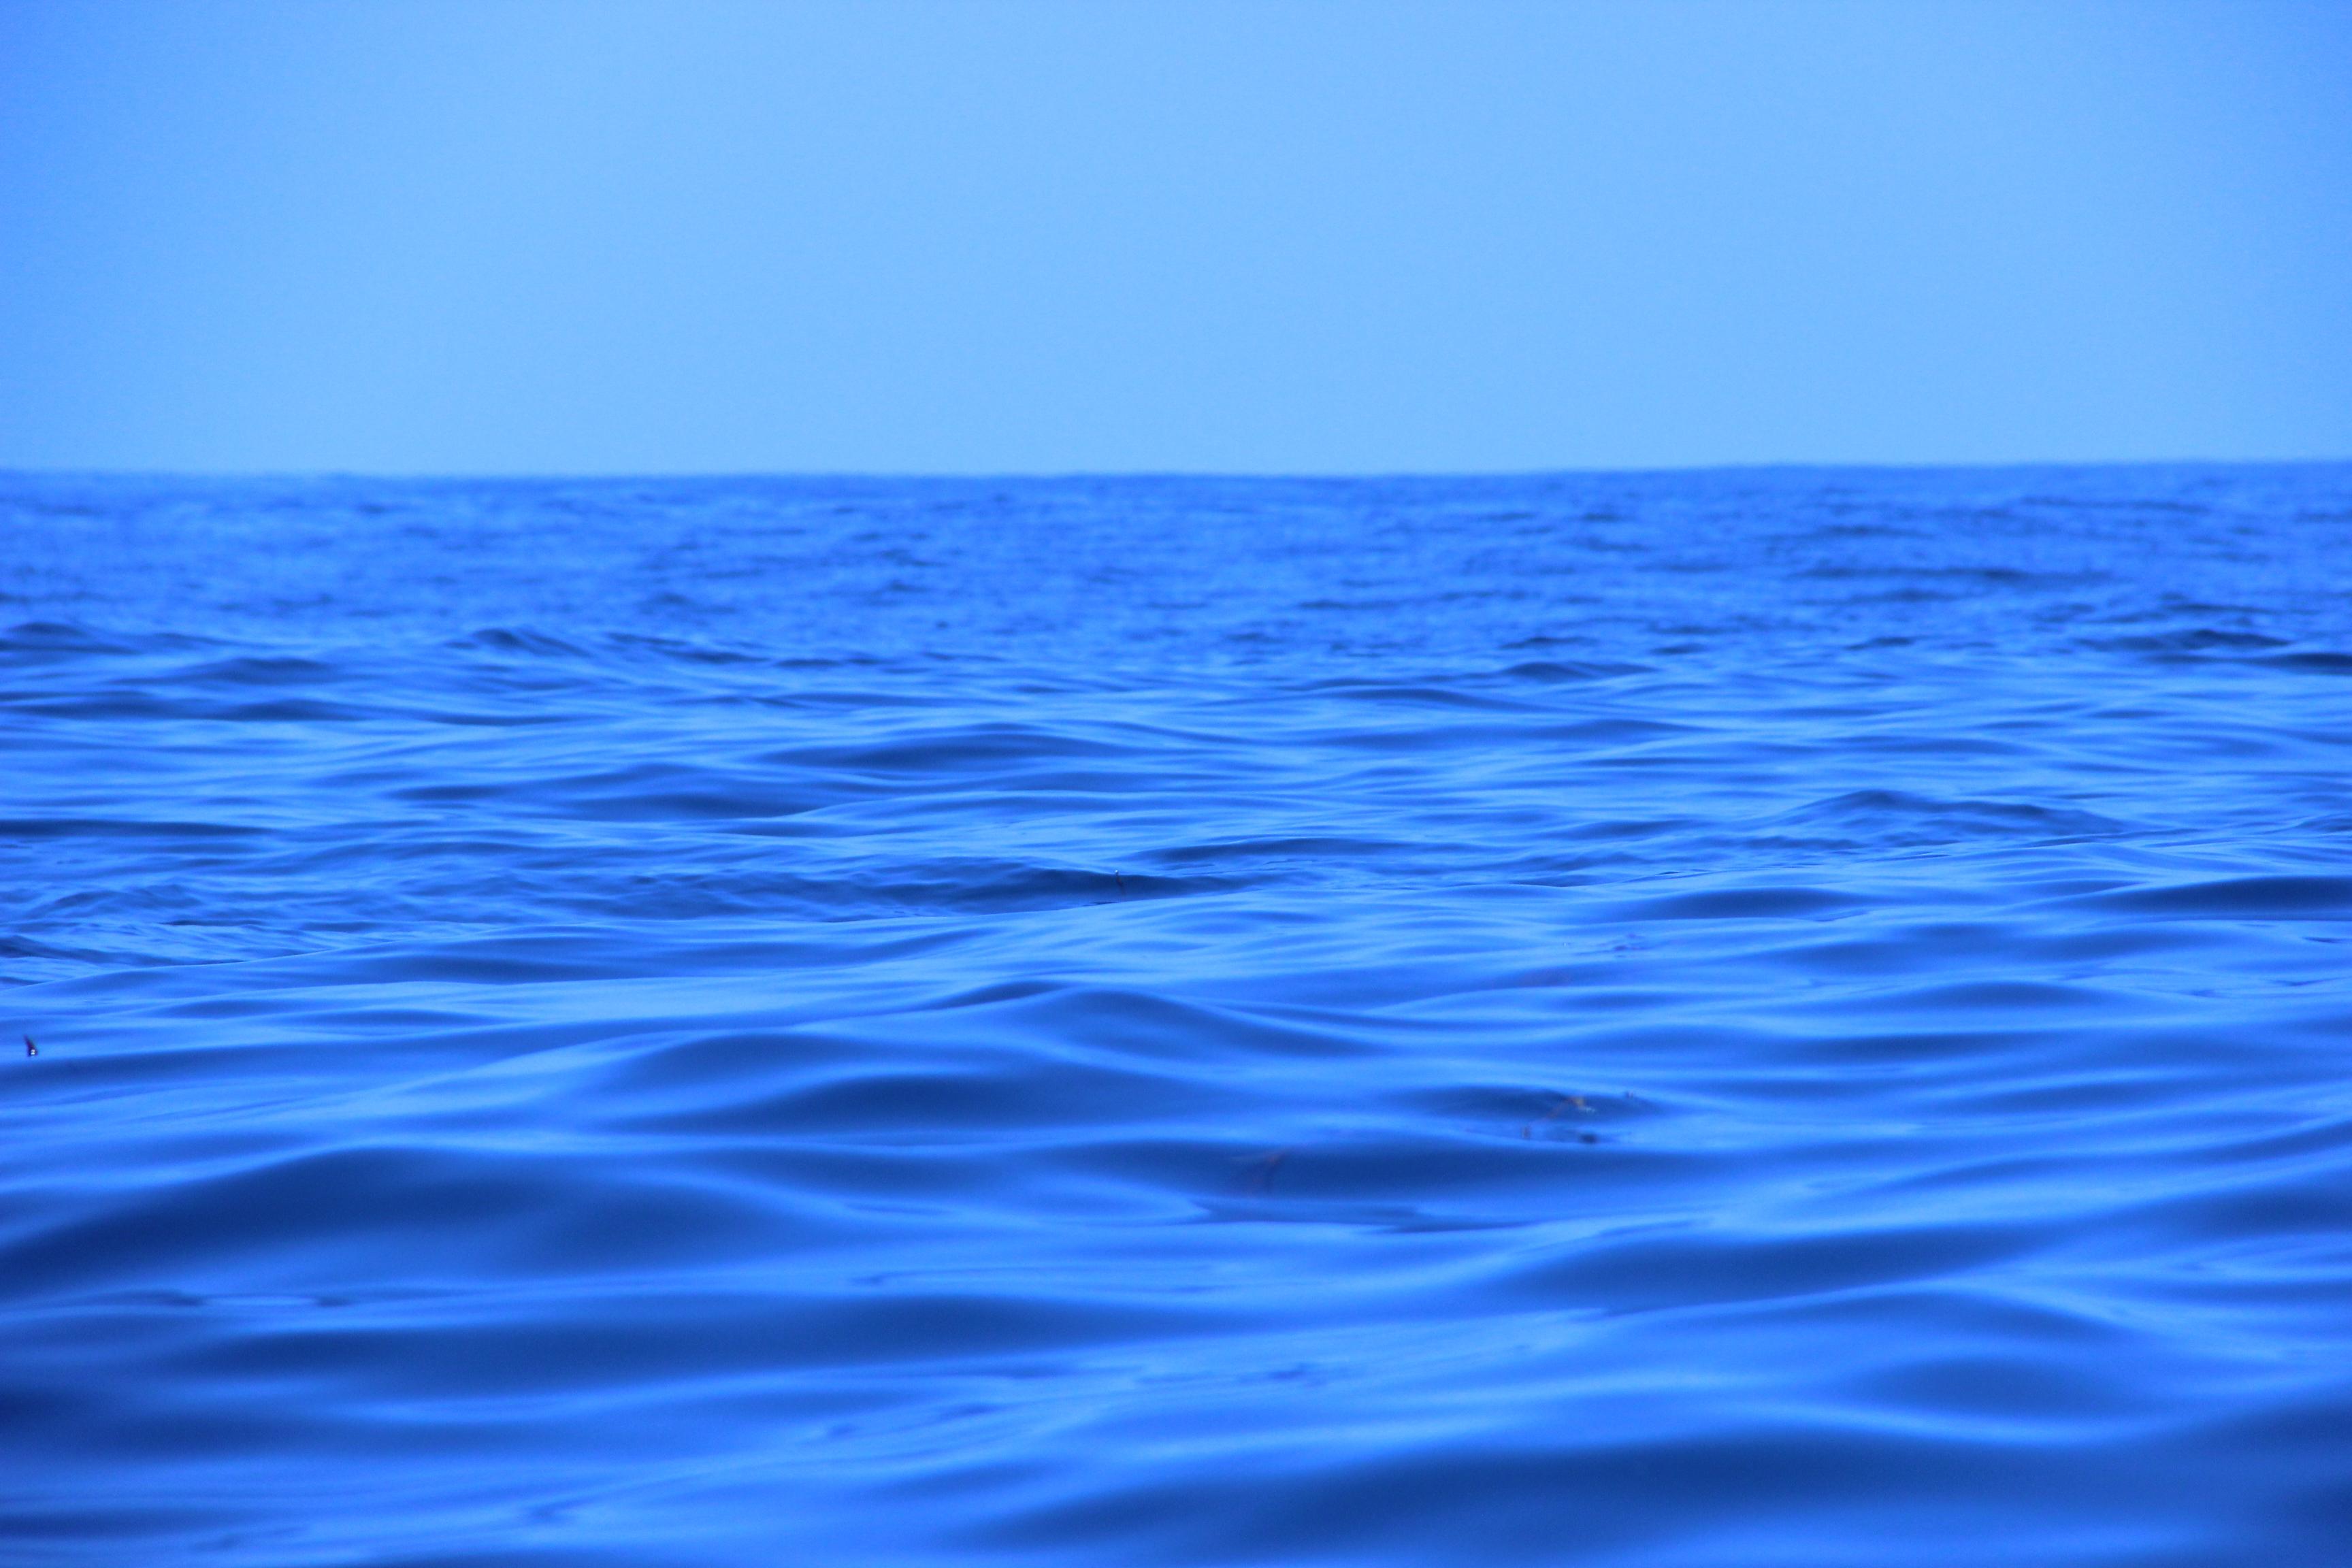 вода океан картинки для подъехали магазину автомобиле